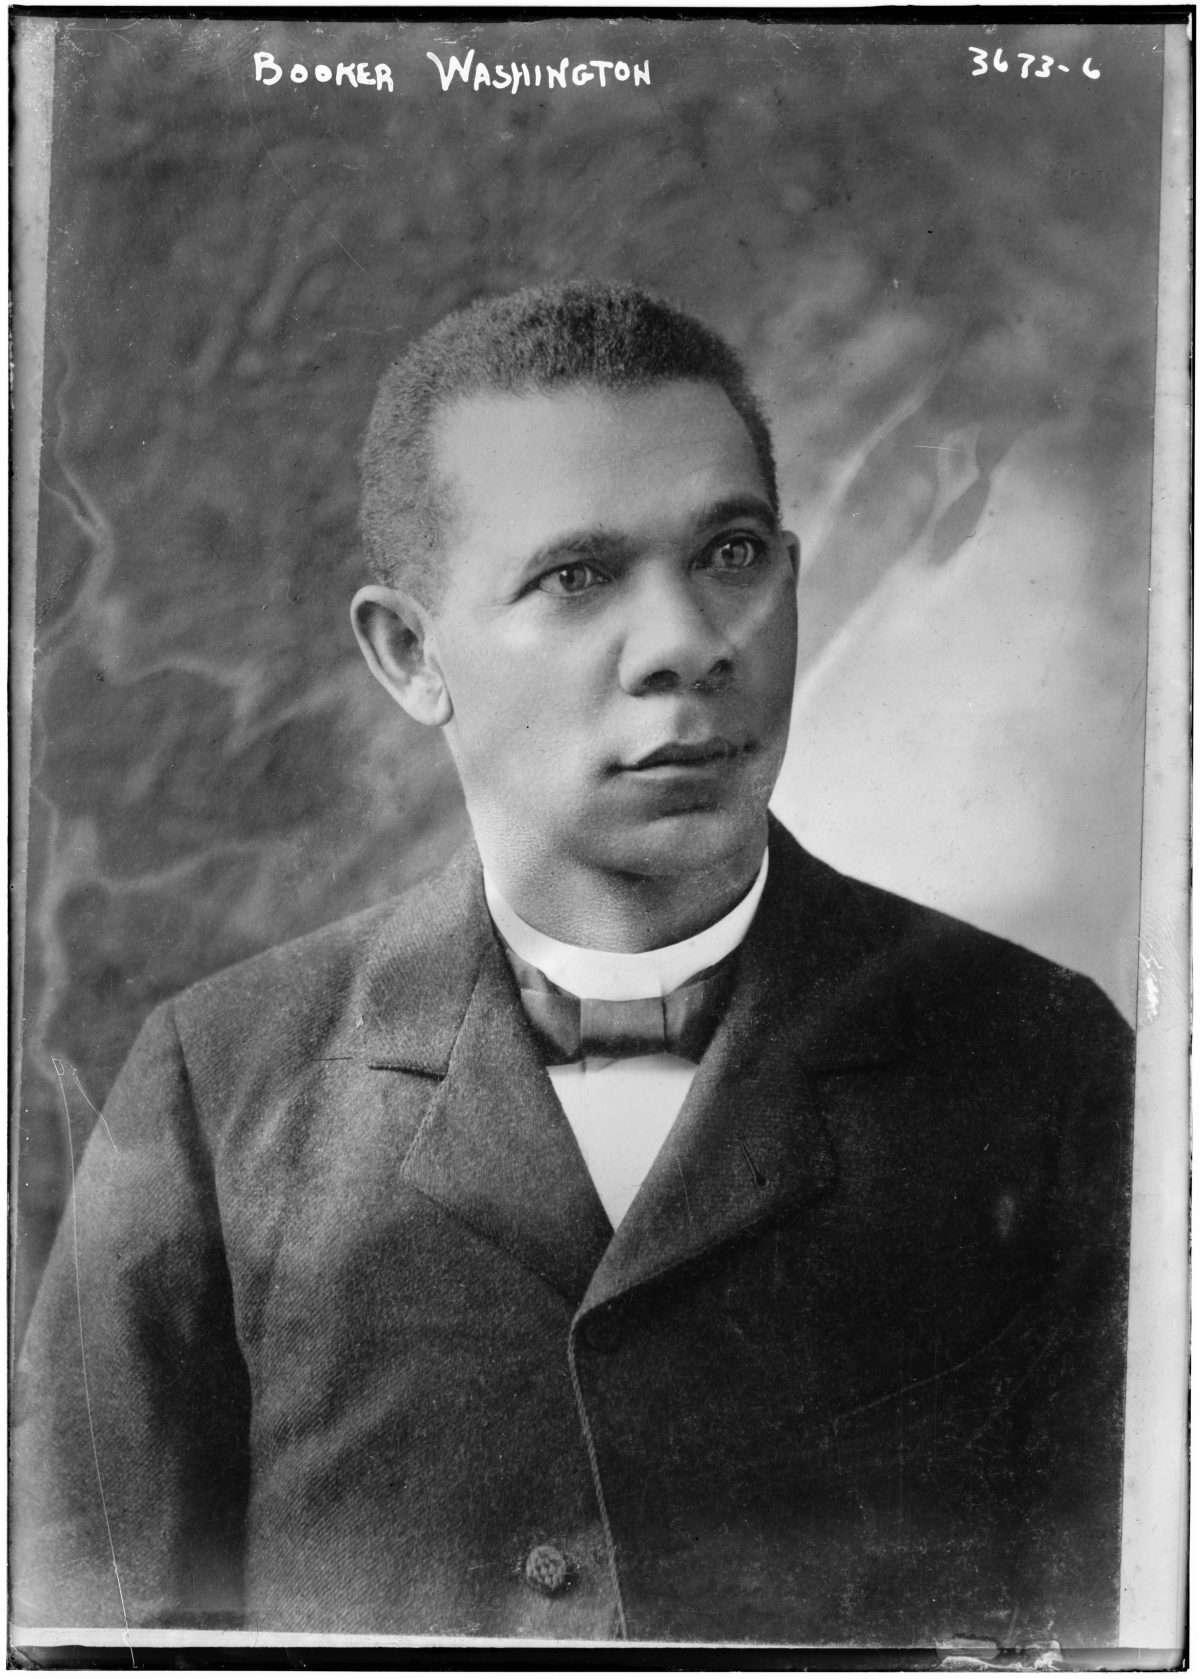 Booker T. Washington as a Young Man